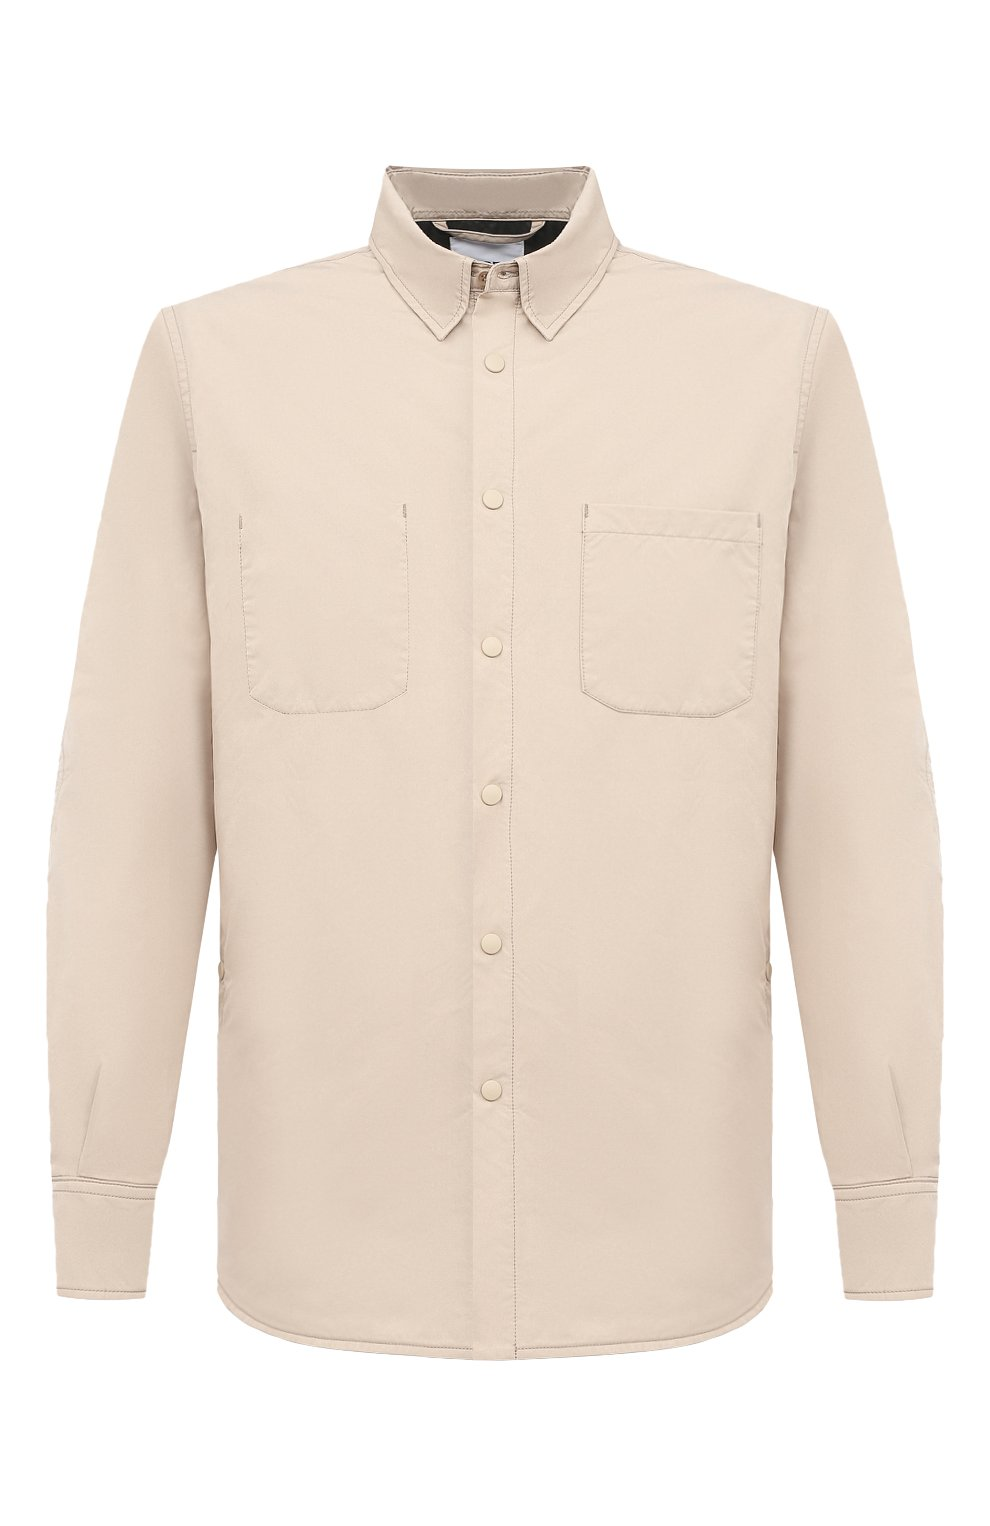 Мужская куртка-рубашка ASPESI бежевого цвета, арт. W0 I 7I29 9972 | Фото 1